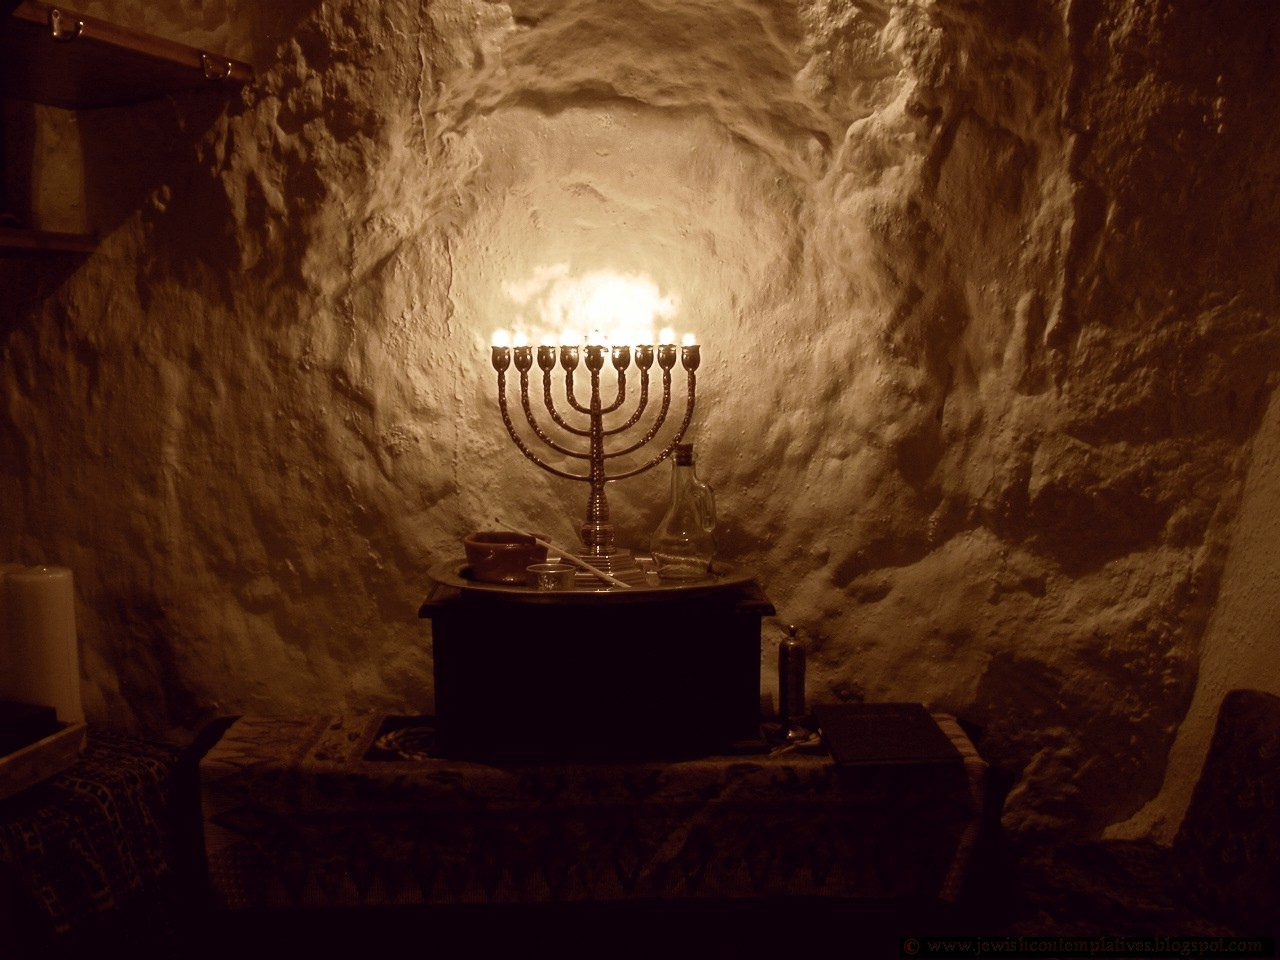 Jewish Contemplatives Lighting A Menorah With One Jar Of